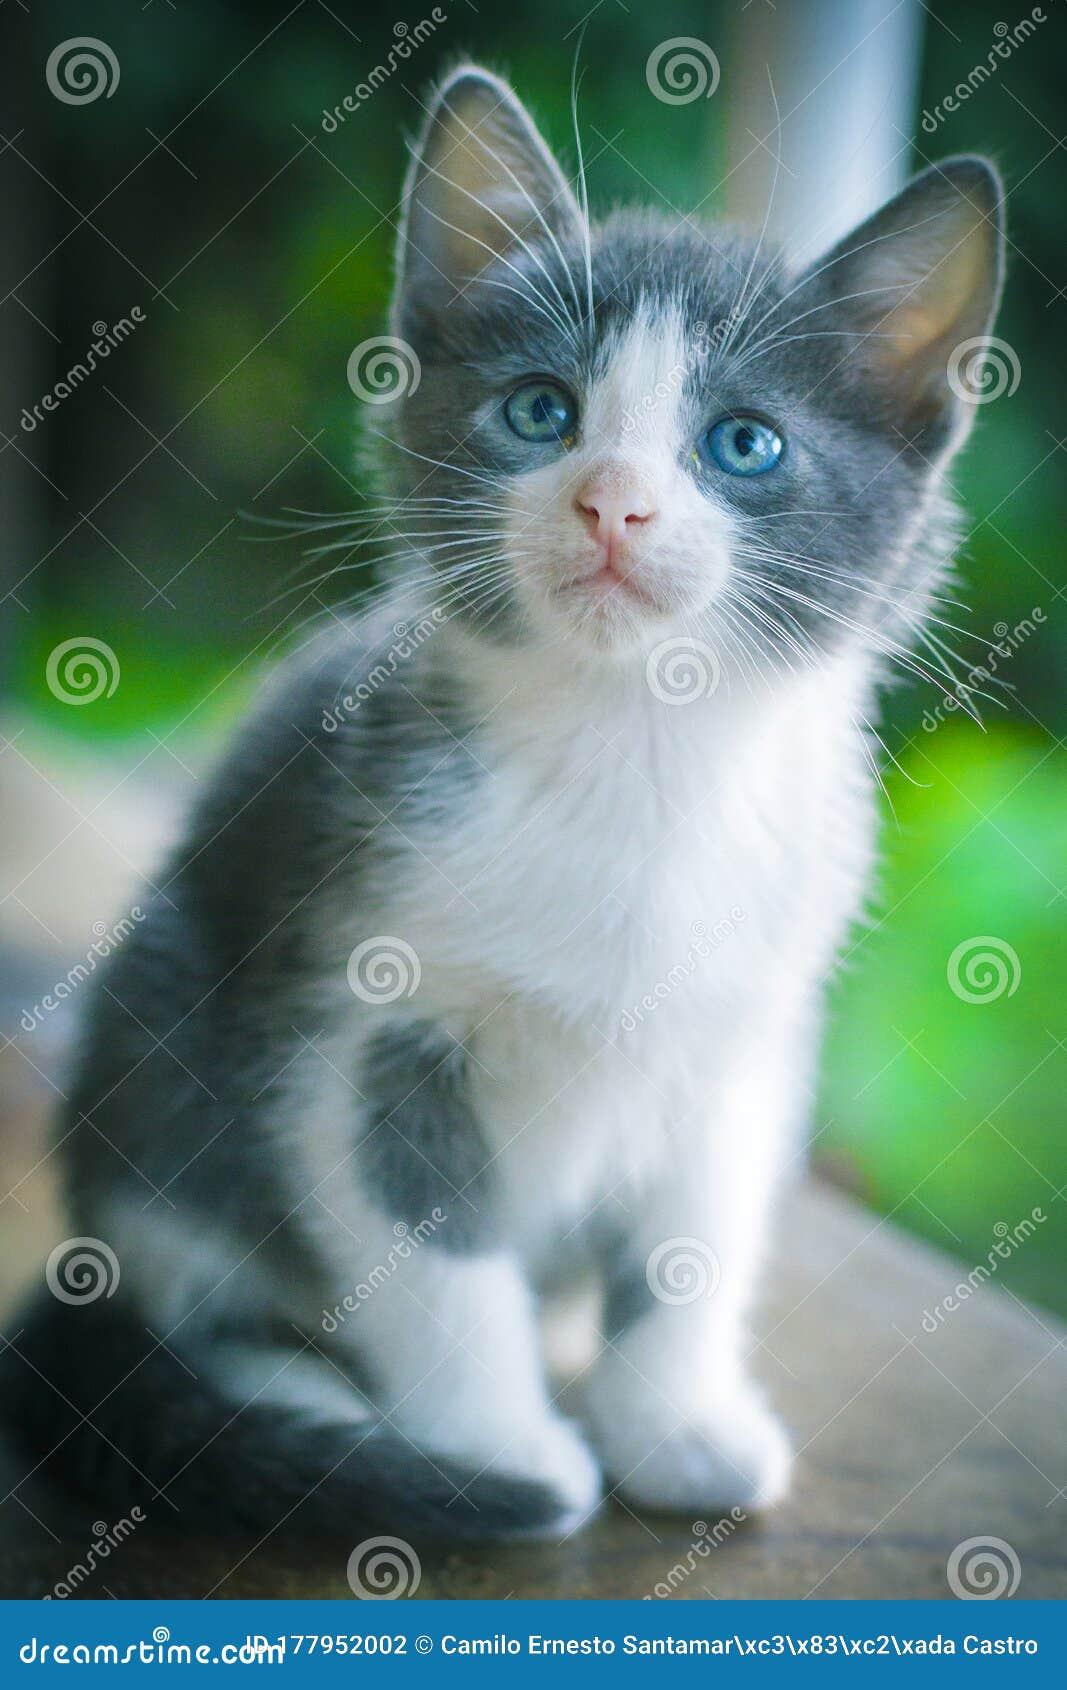 Baby Cat Beautiful Pet Enjoying The Outdoors Stock Photo Image Of Spots Cute 177952002